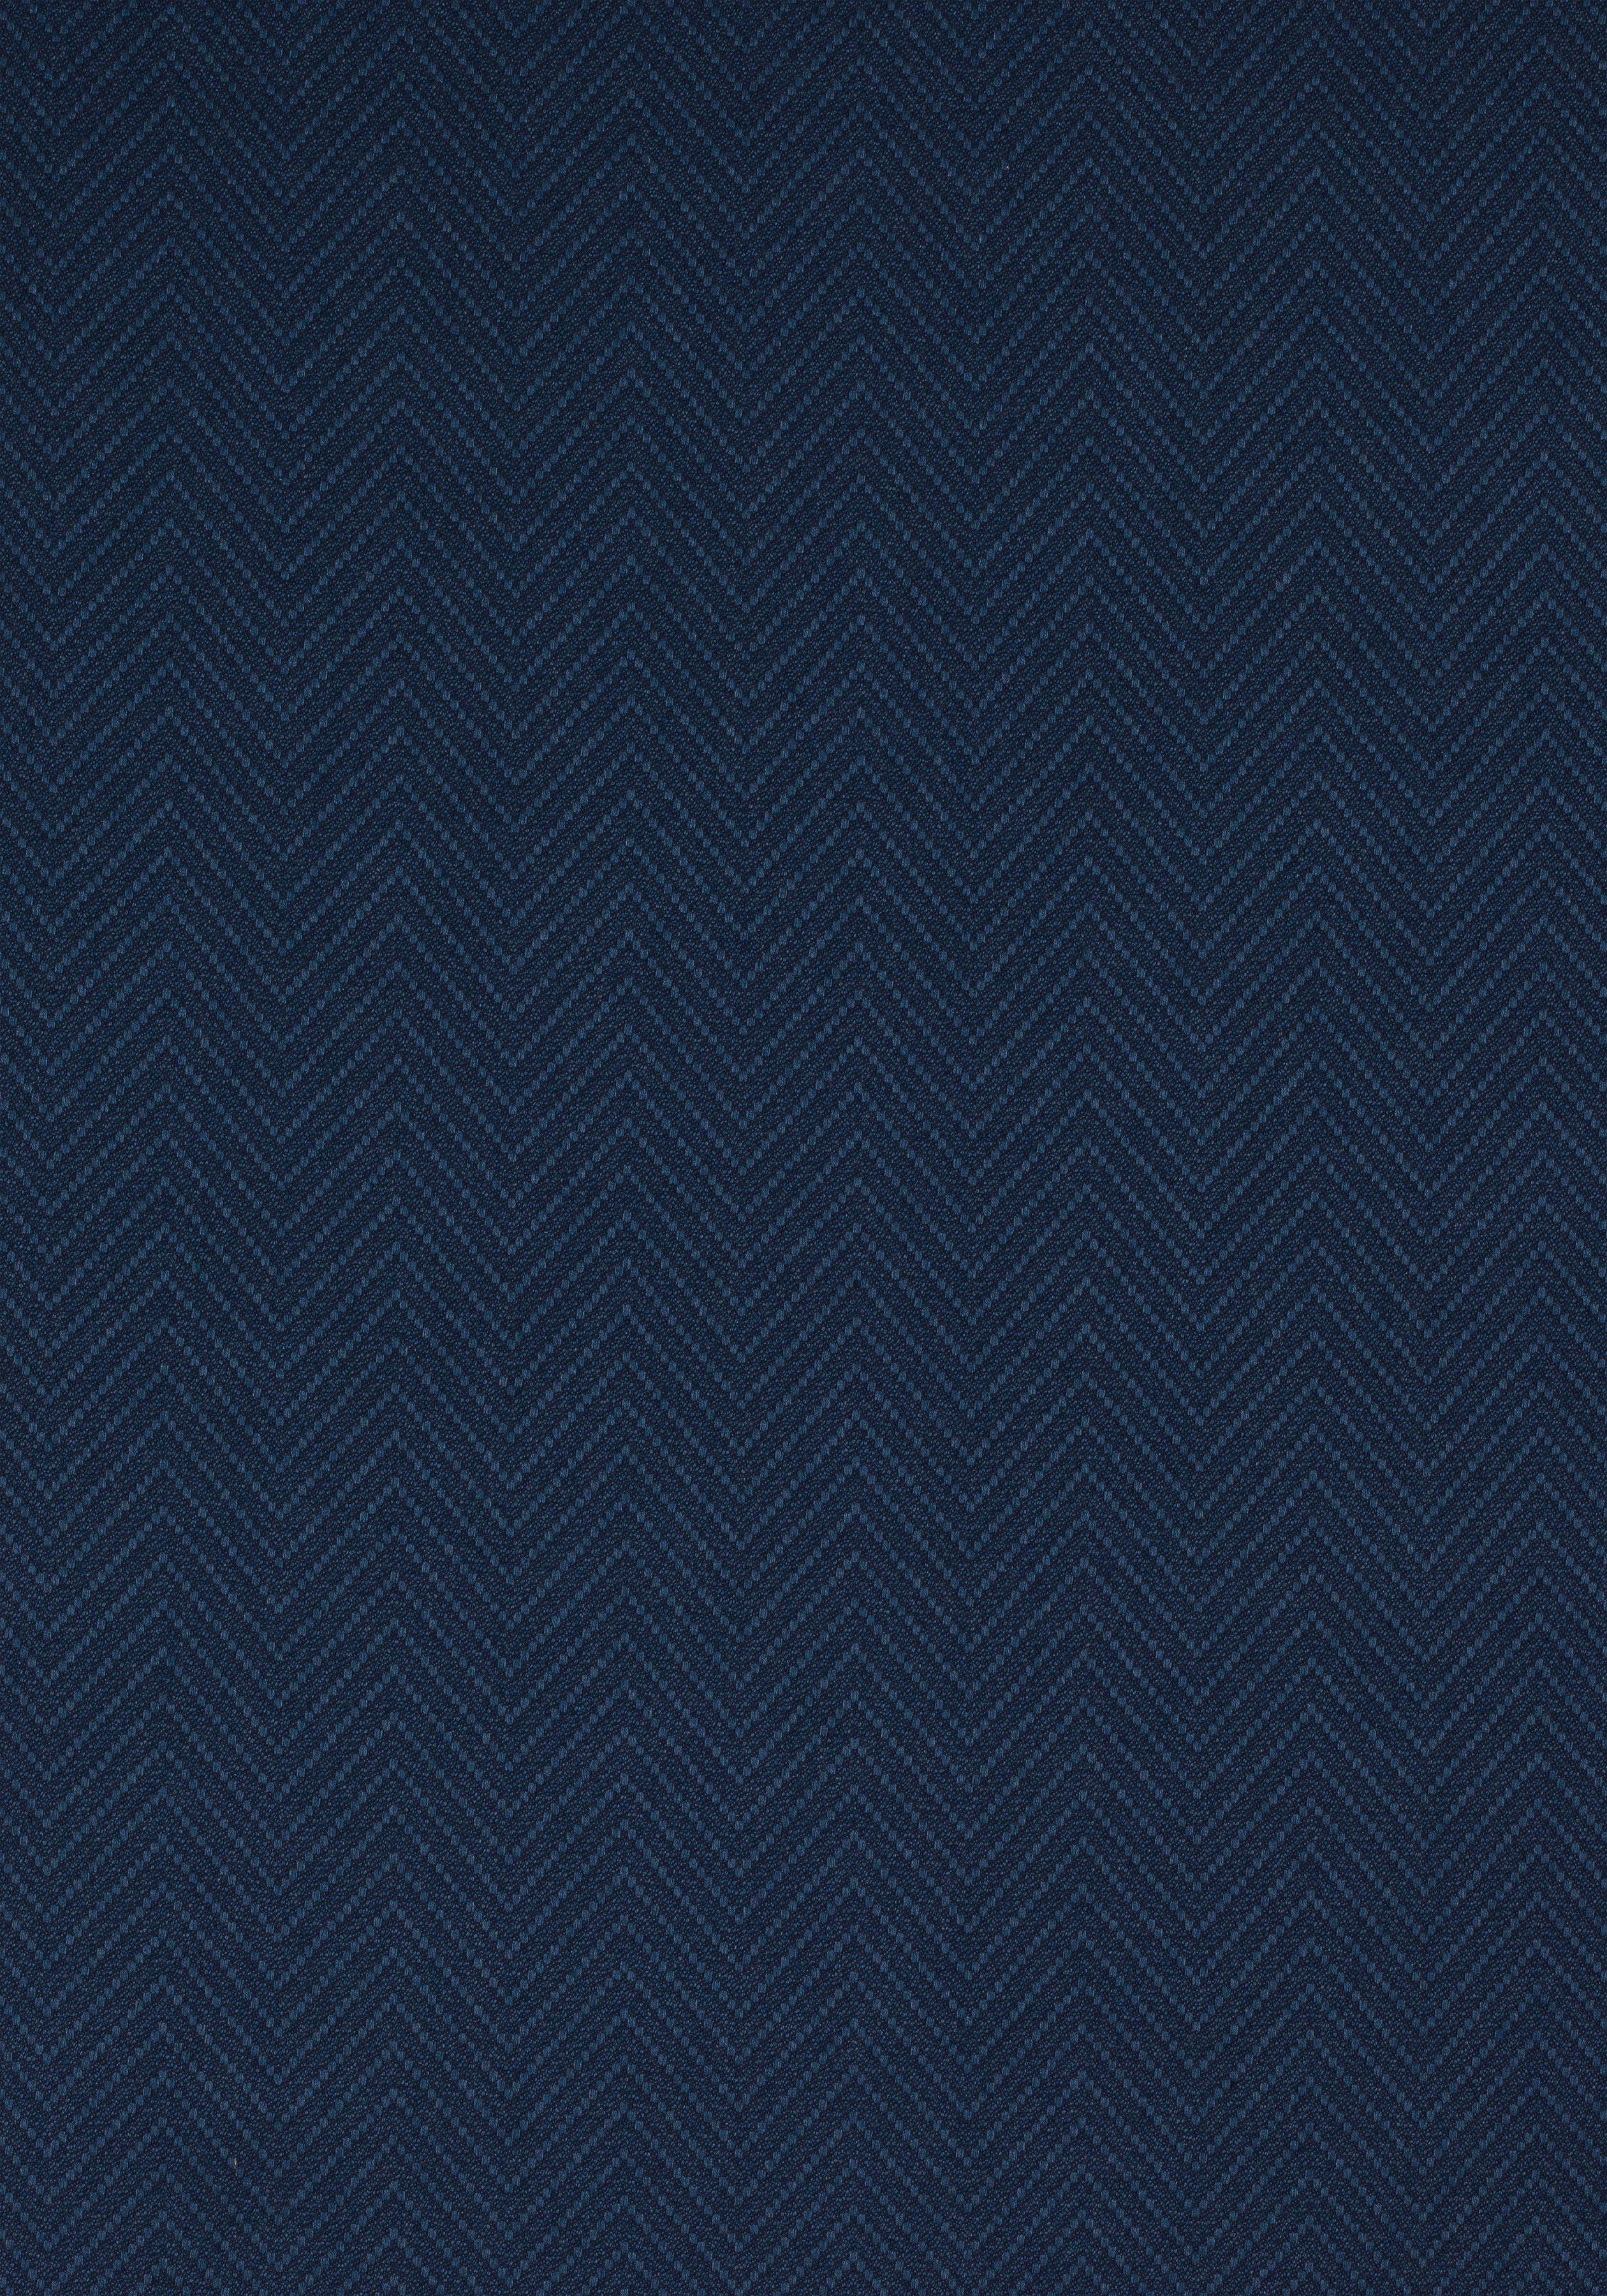 W80008 Blue Fabric Texture Herringbone Wallpaper Navy Wallpaper